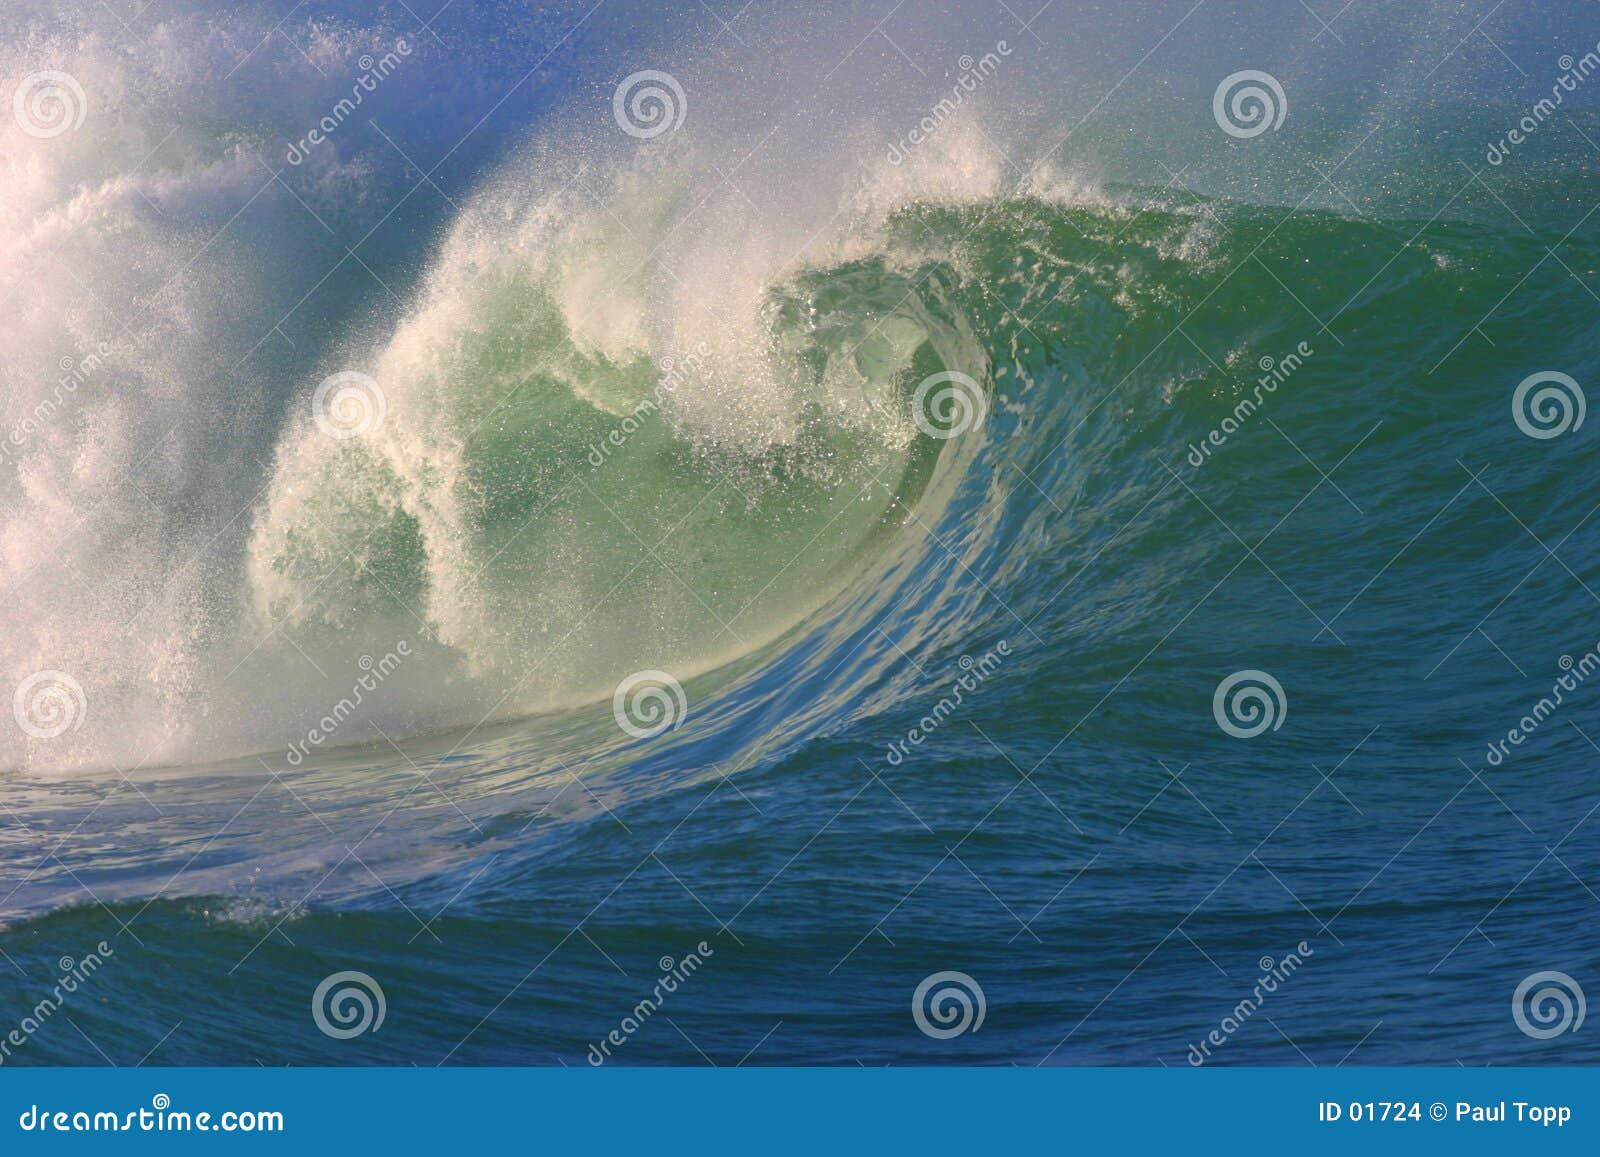 Crashing Surf Wave